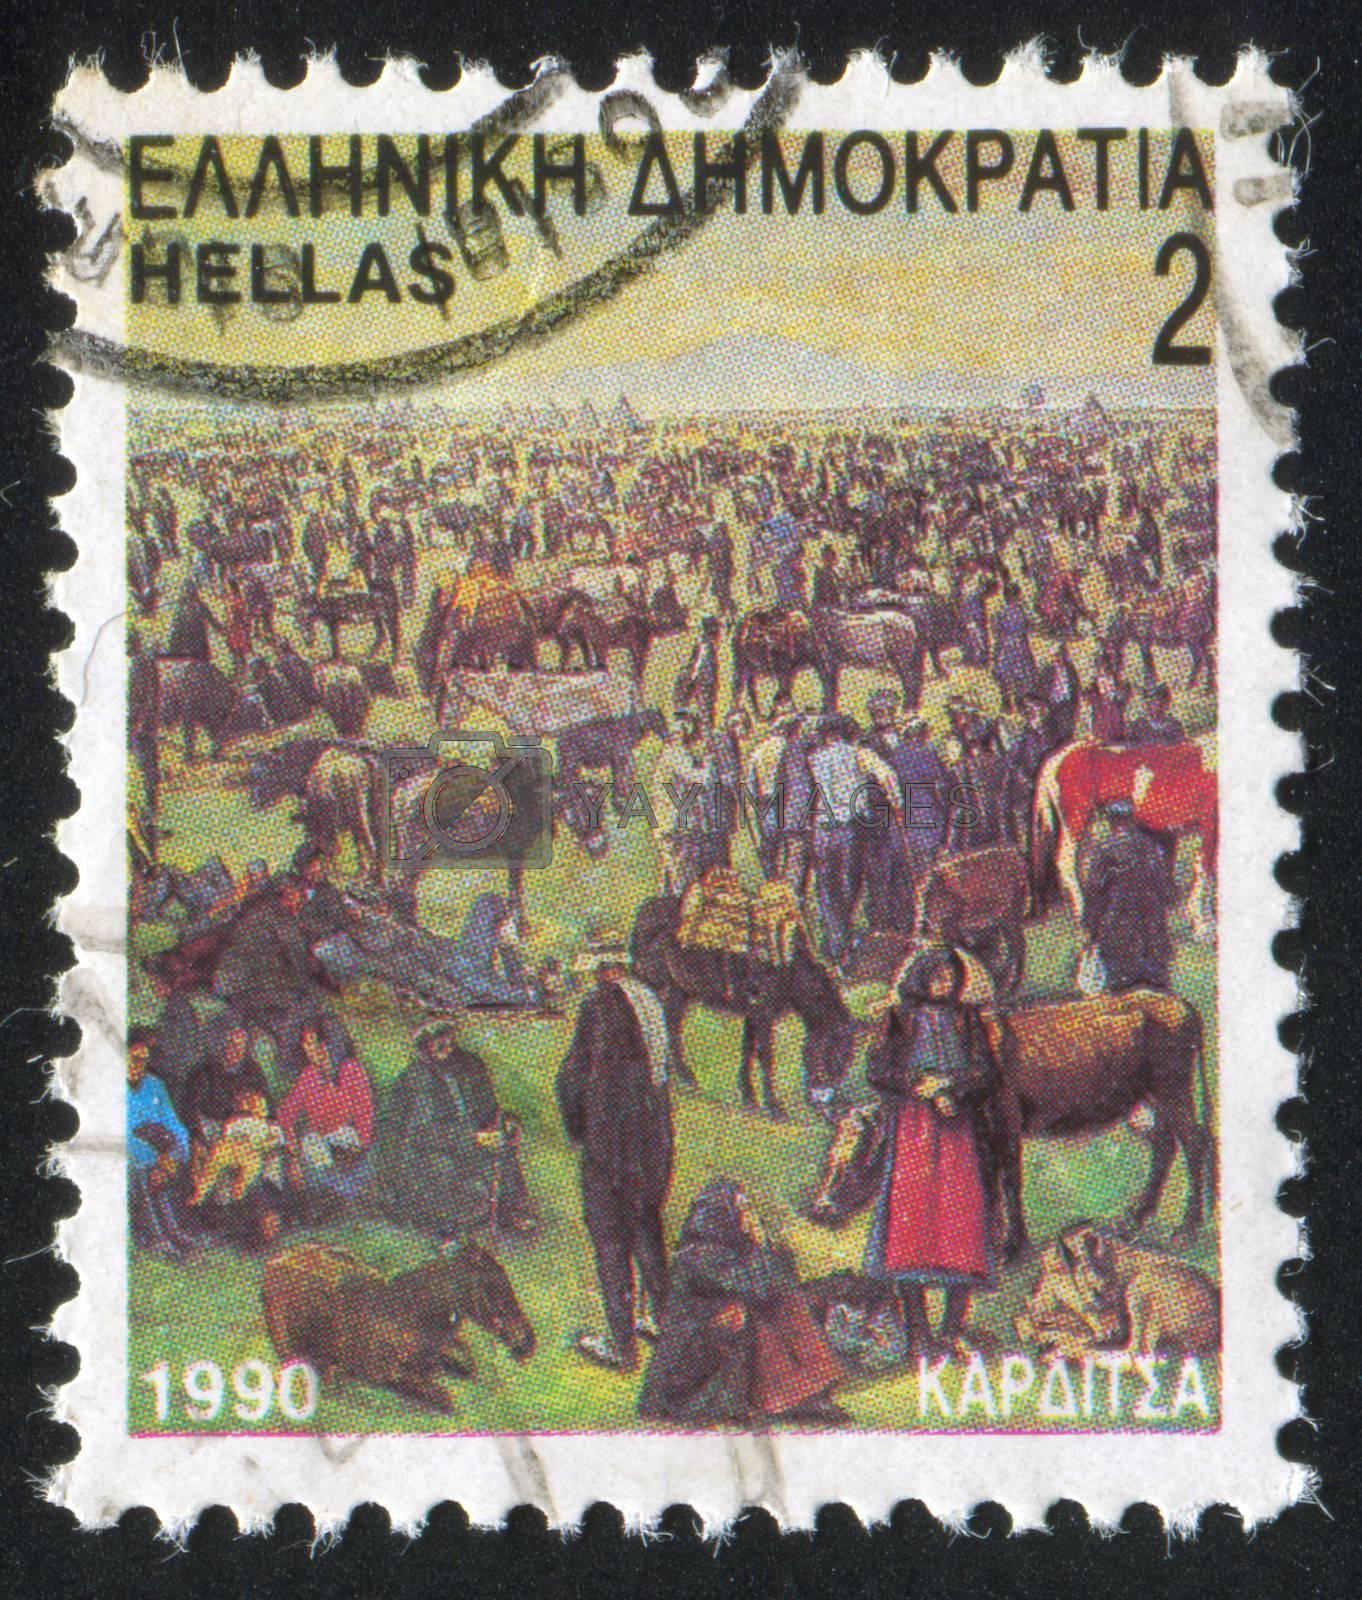 GREECE - CIRCA 1990: stamp printed by Greece, shows Karditsa, the commercial animal fair, circa 1990